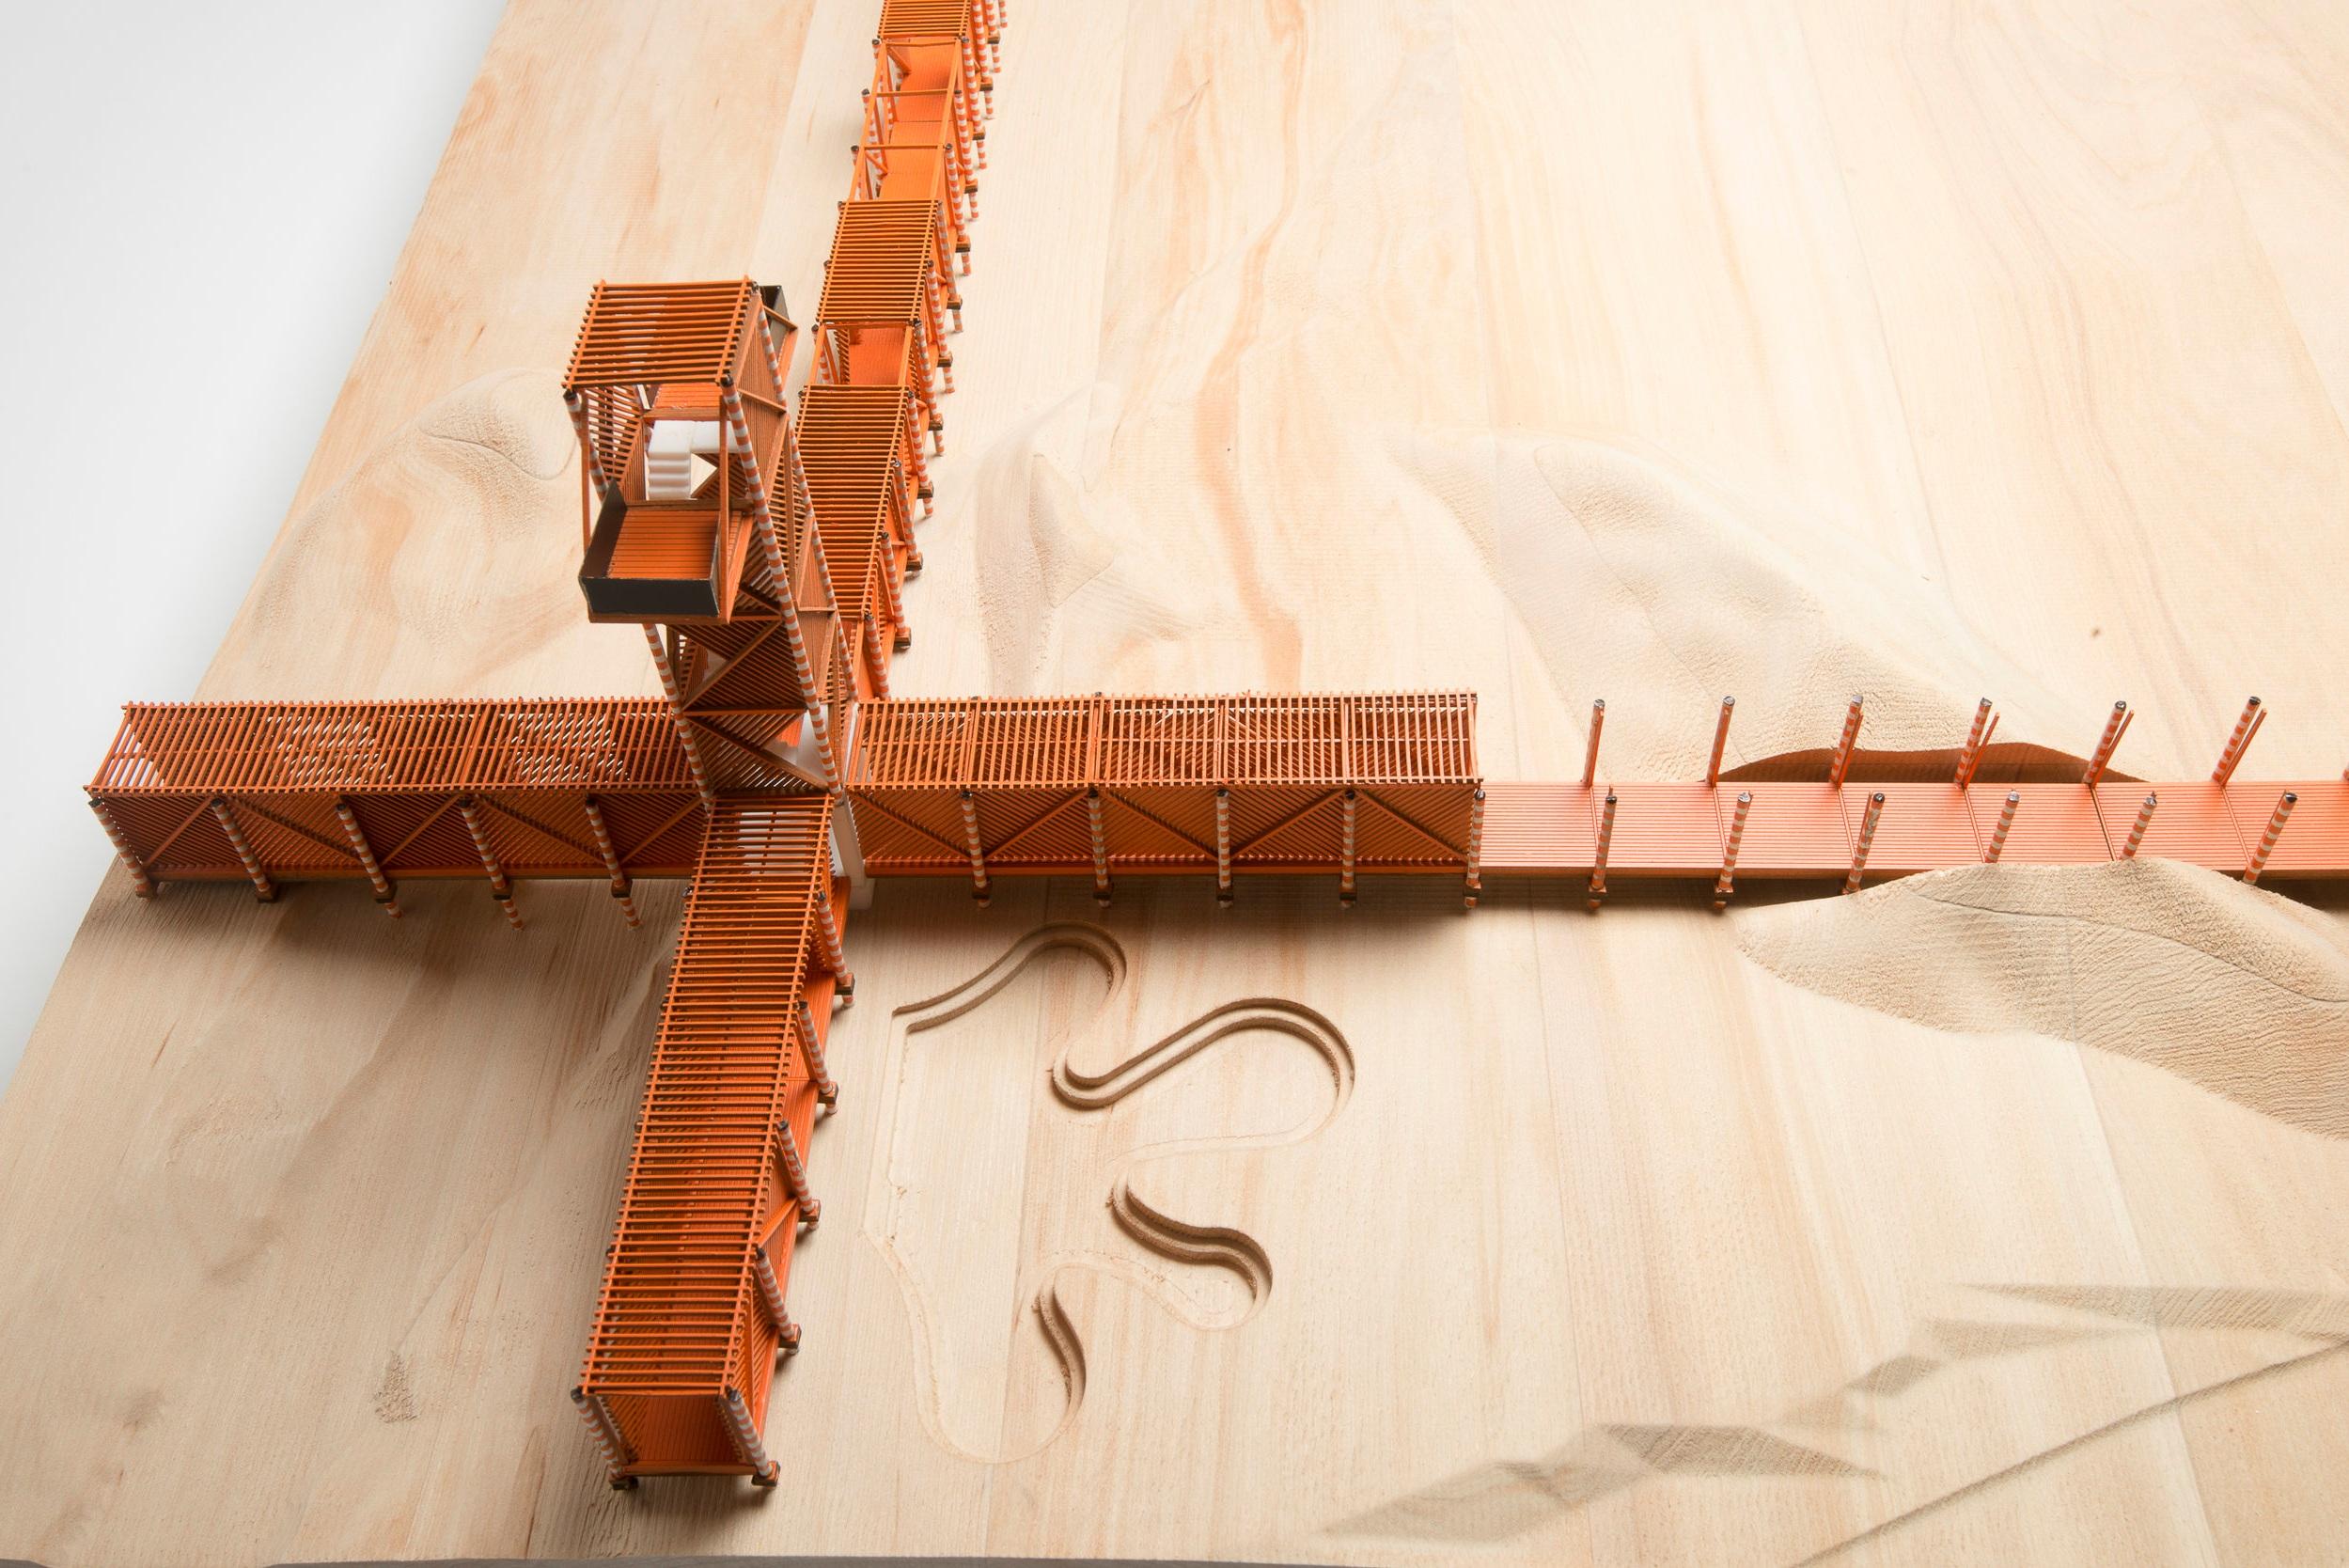 Open Work in Progress: - Kapiti Watchtower by the Wellington team of Sam Kebbell, Cam Wilson, Riley Adams-Winch, Callum Leslie, Andrew Charleson and Martin Bryant